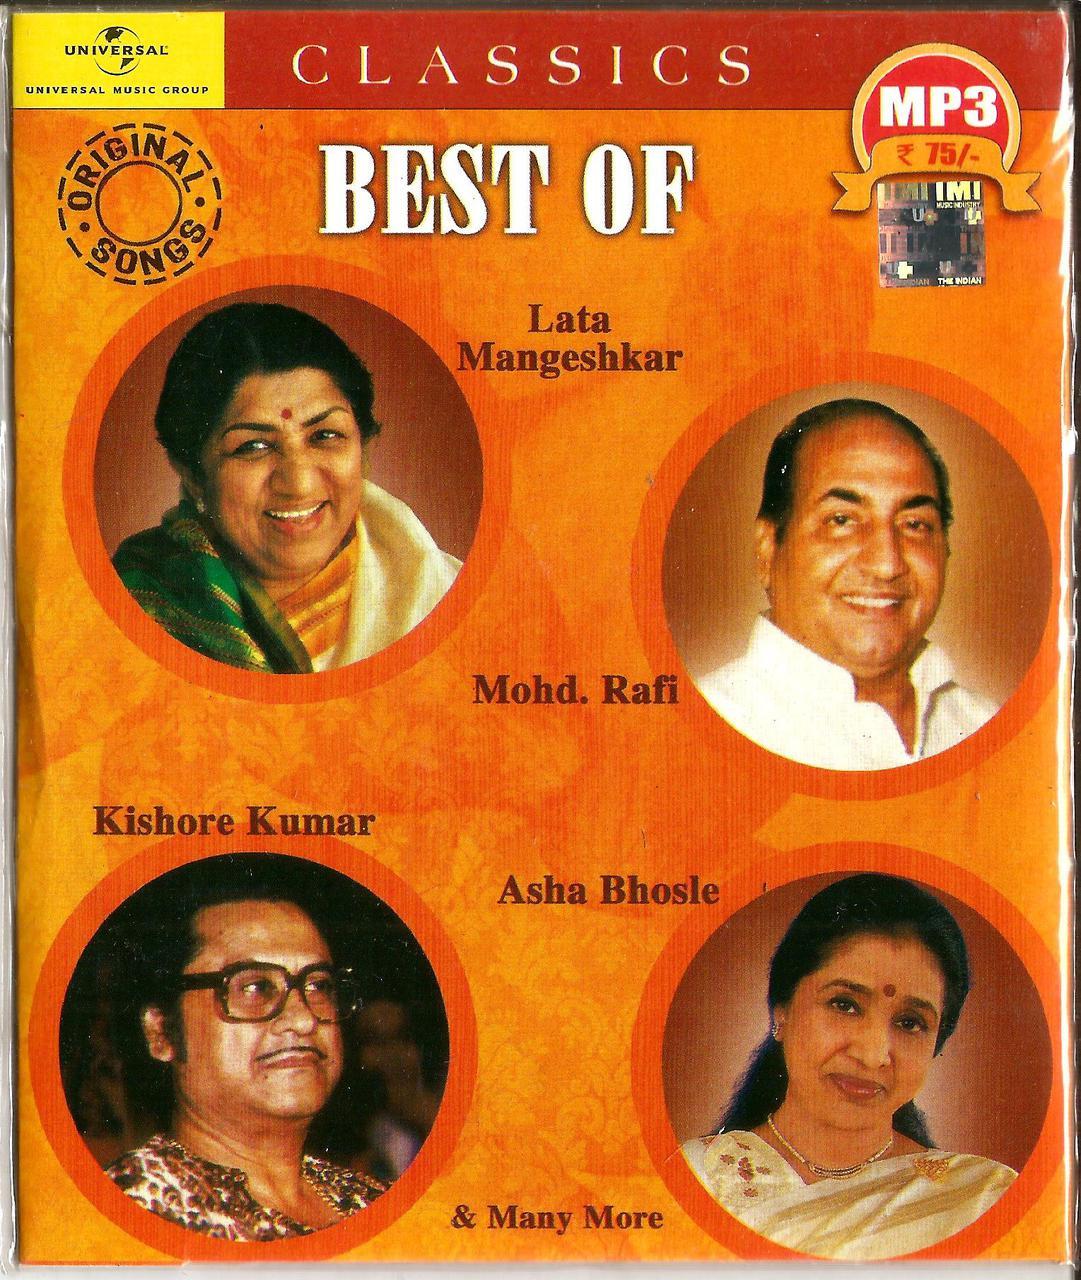 Best Of Lata Mangeshkar/Mohd  Rafi/Kishore Kumar/Asha Bhosle & Many More /  MP3